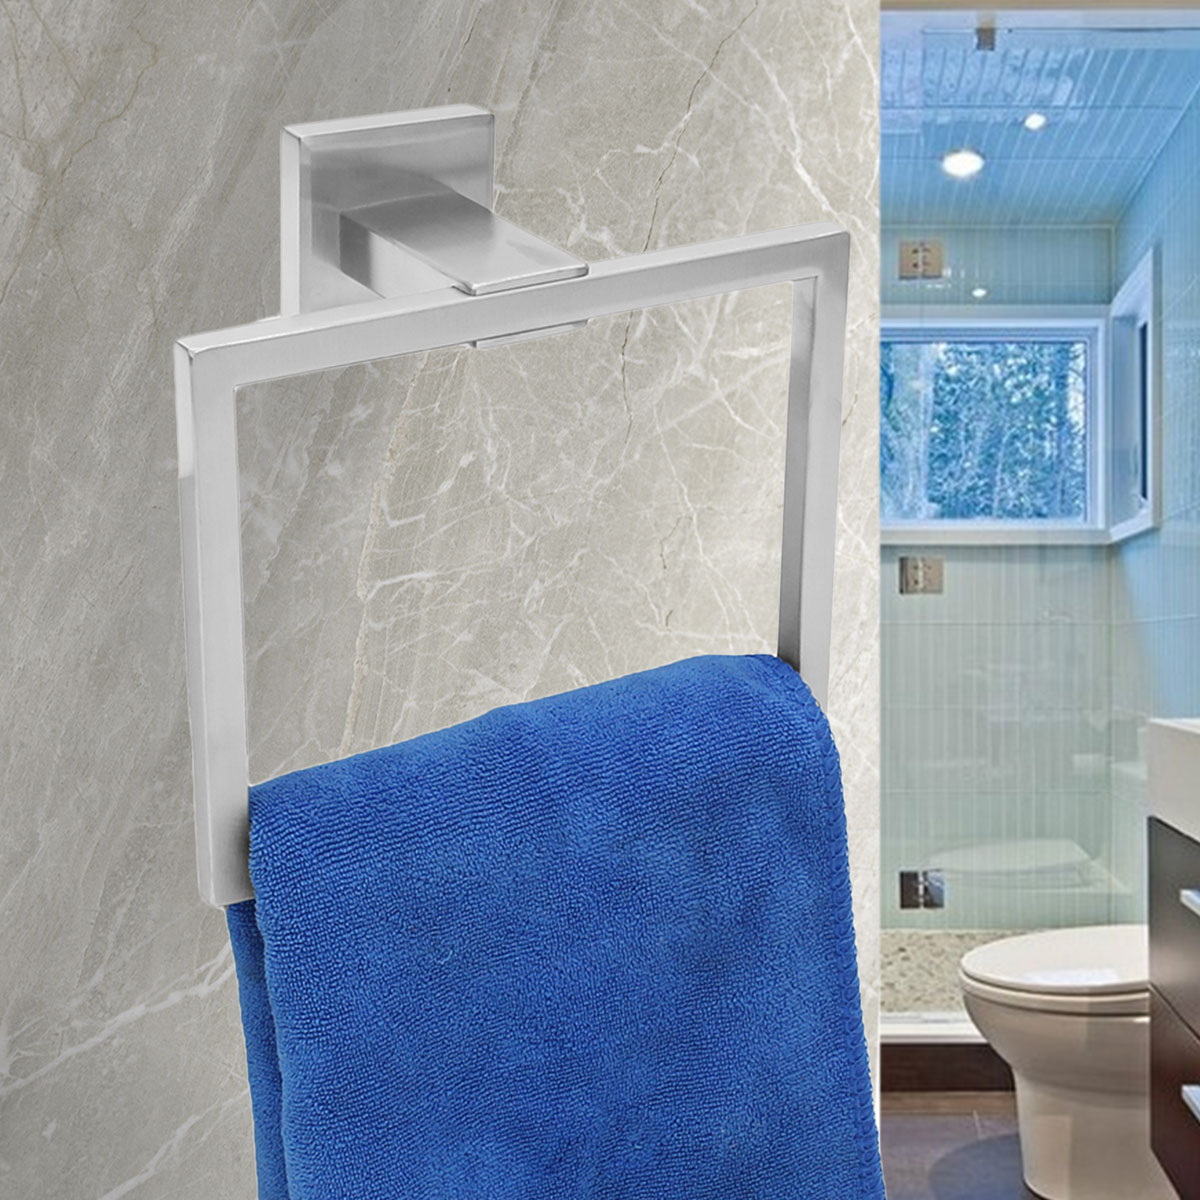 steel chrome hand towel rail holder wall mounted bathroom square rh ebay co uk